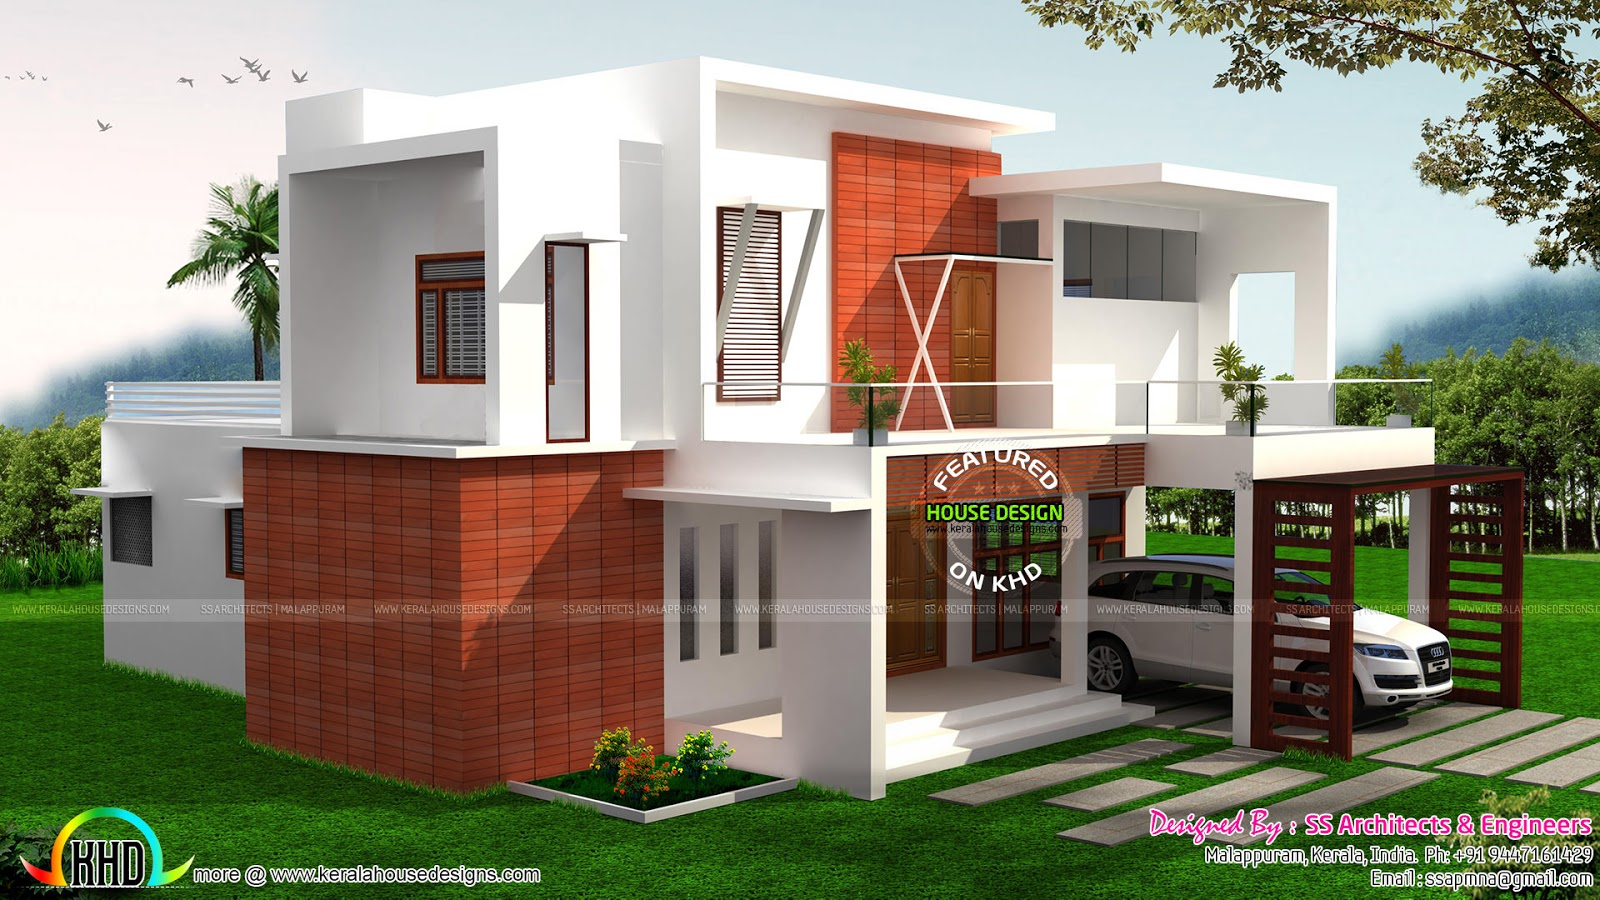 2605 Sq Ft Modern House Plan Architecture Kerala Home